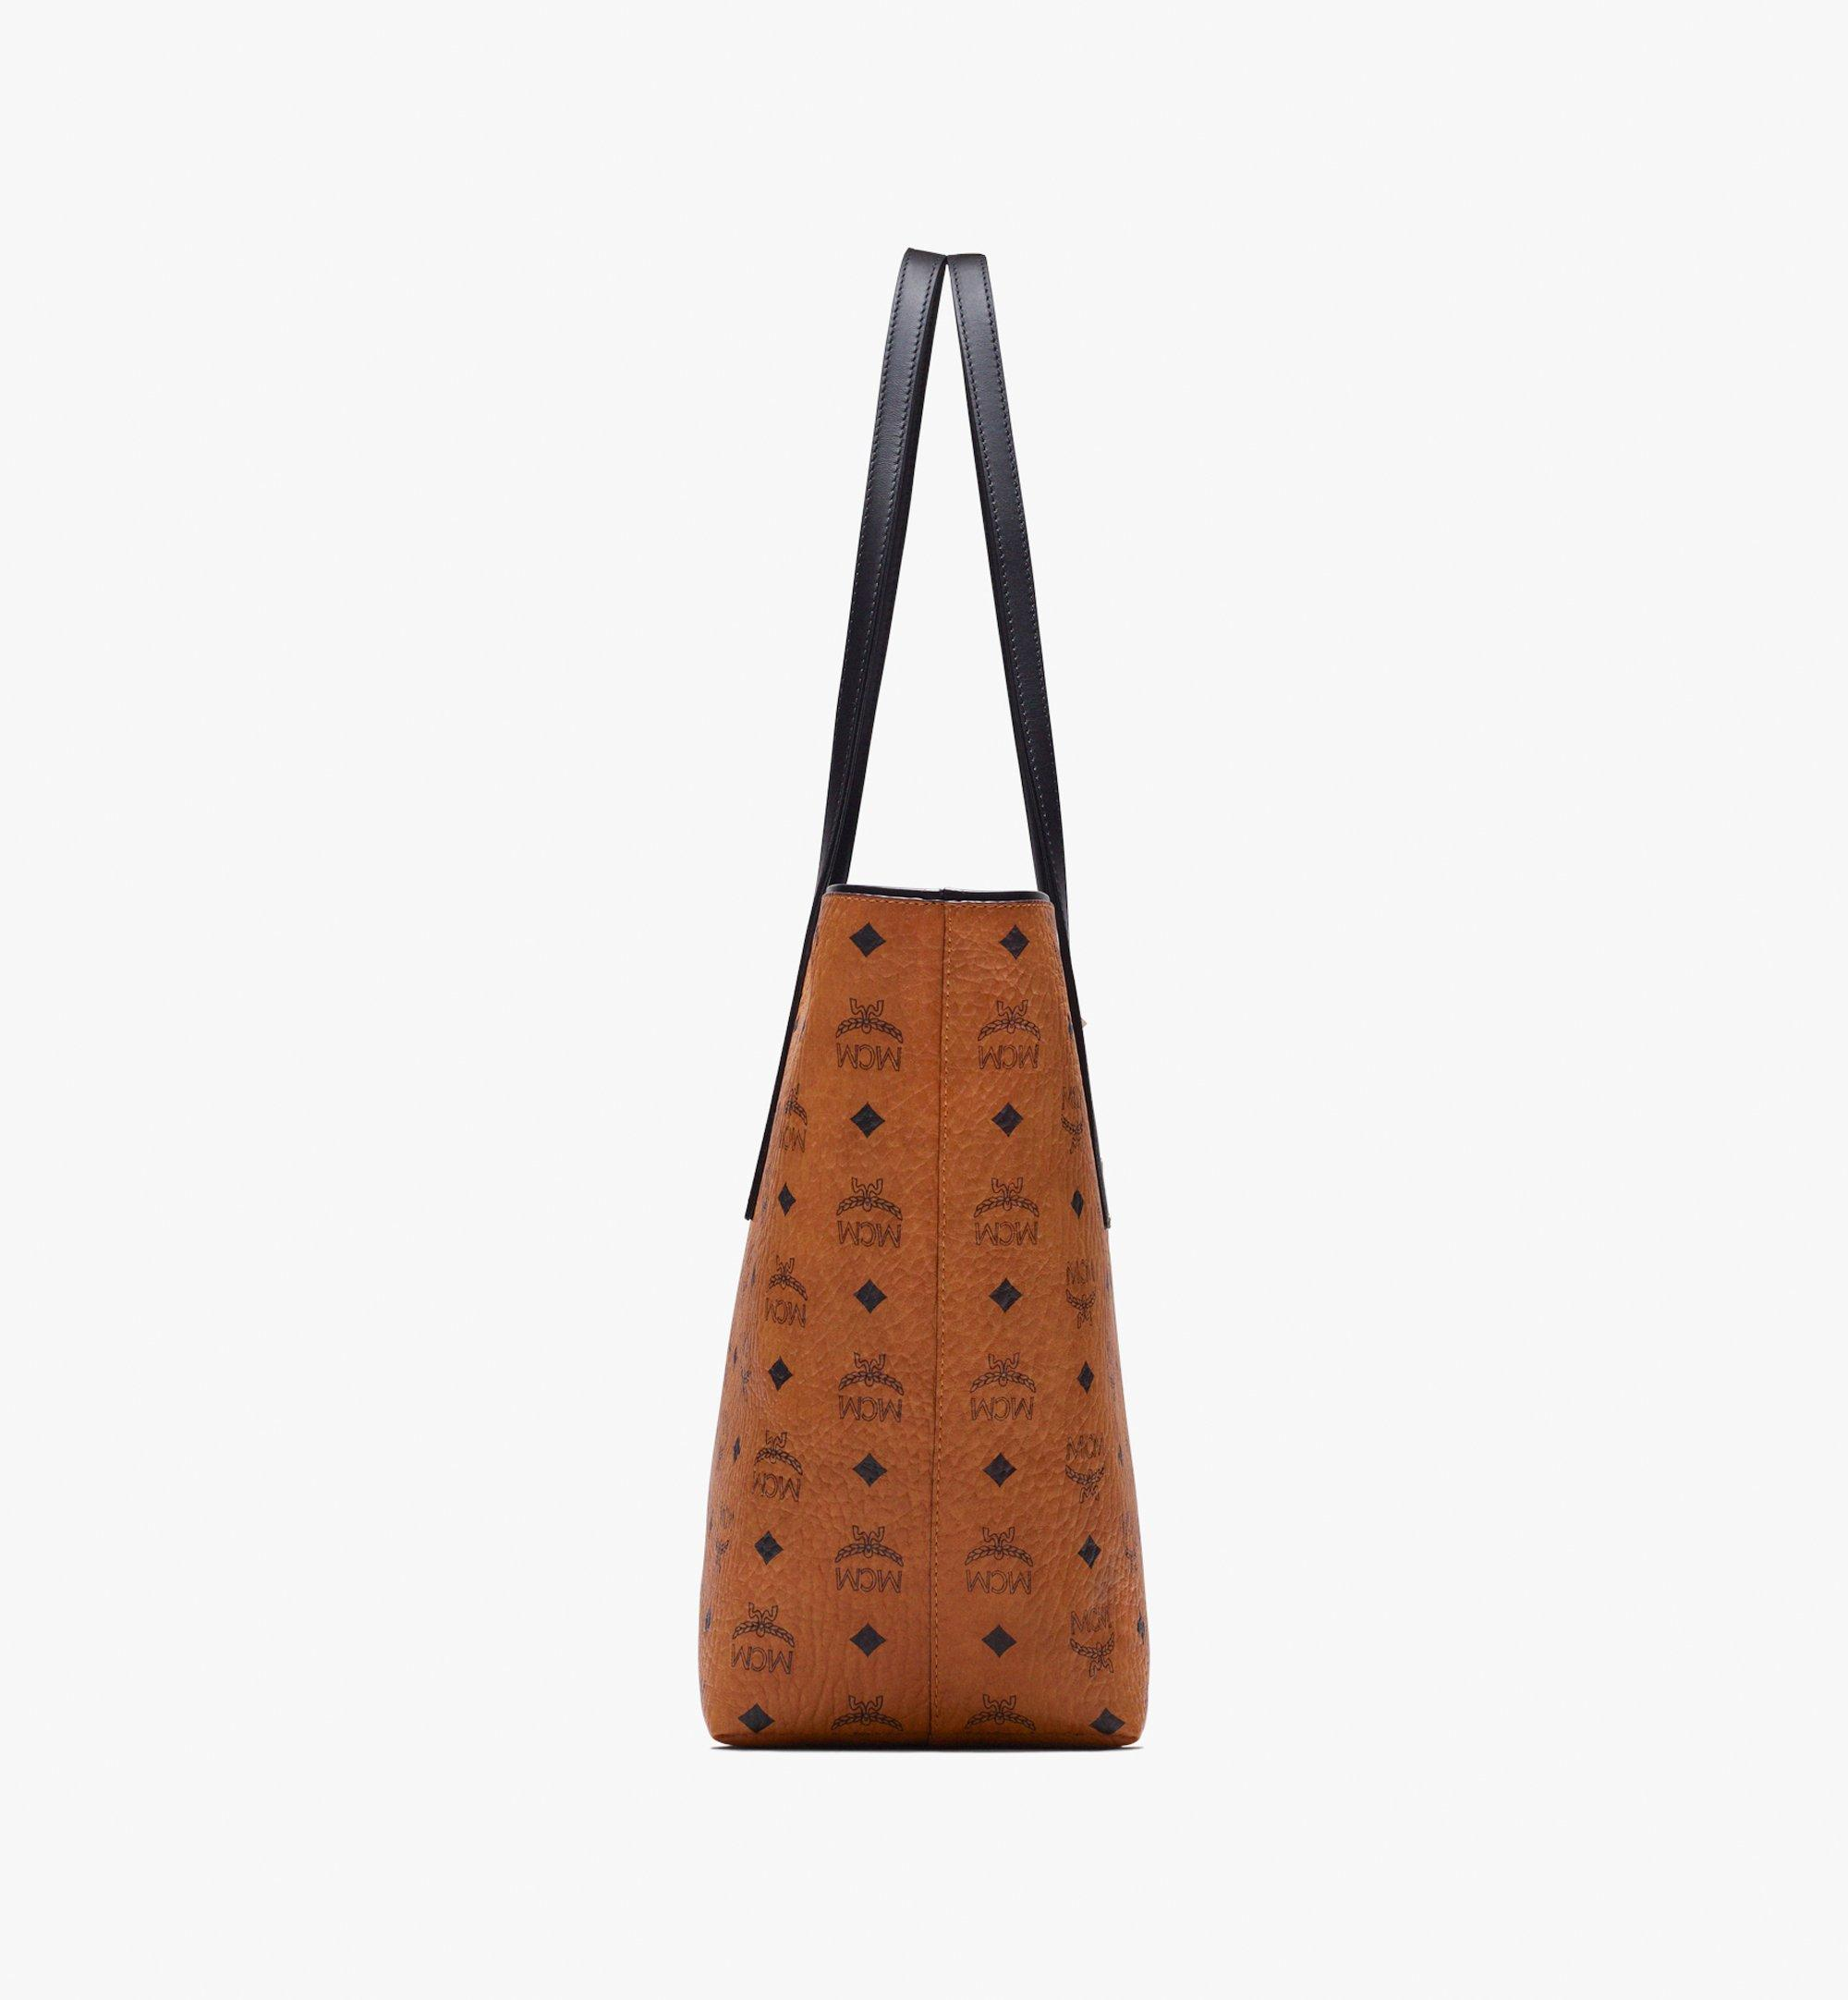 Medium Anya Shopper in Visetos Cognac   MCM® DE